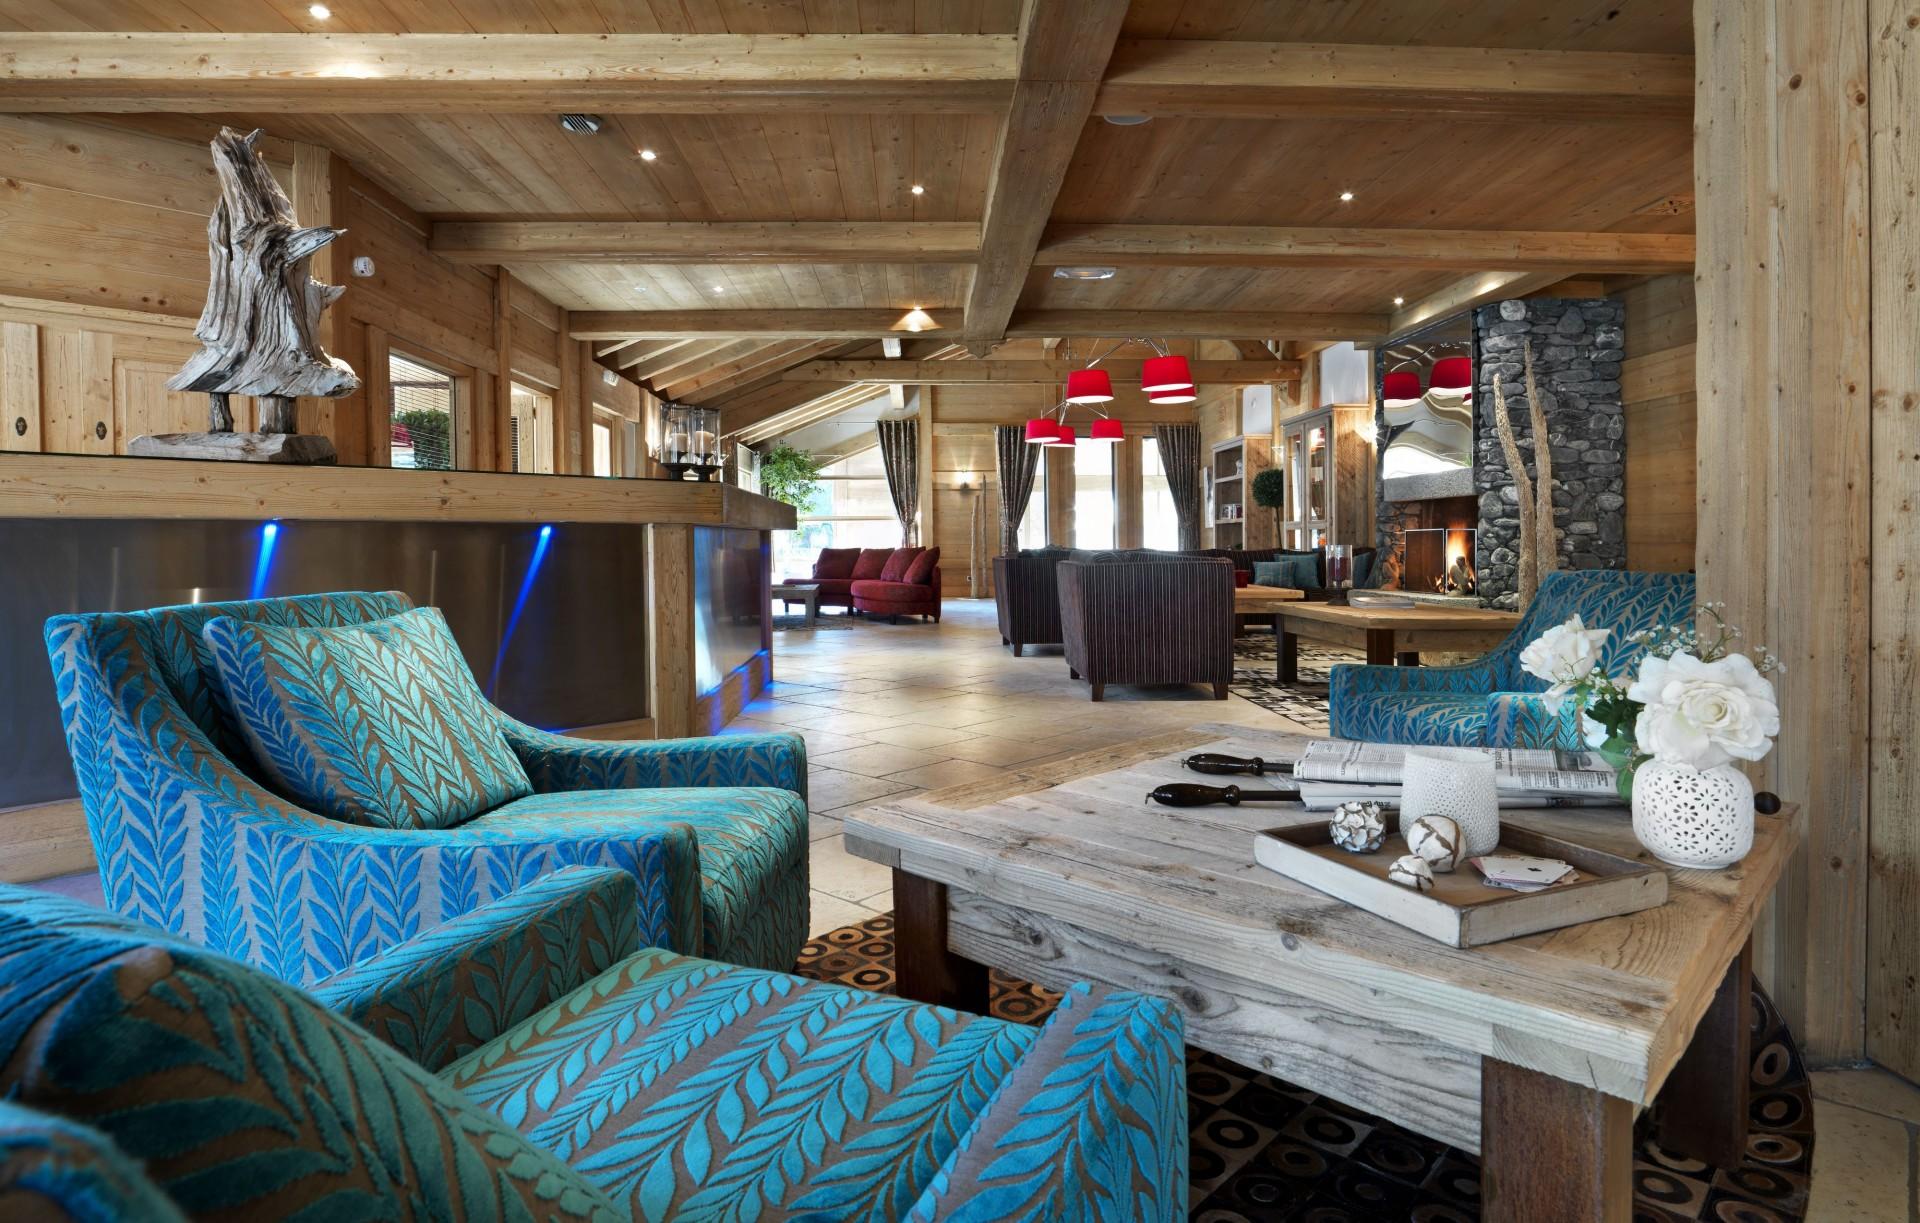 Samoens Location Appartement Luxe Salis Réception 1